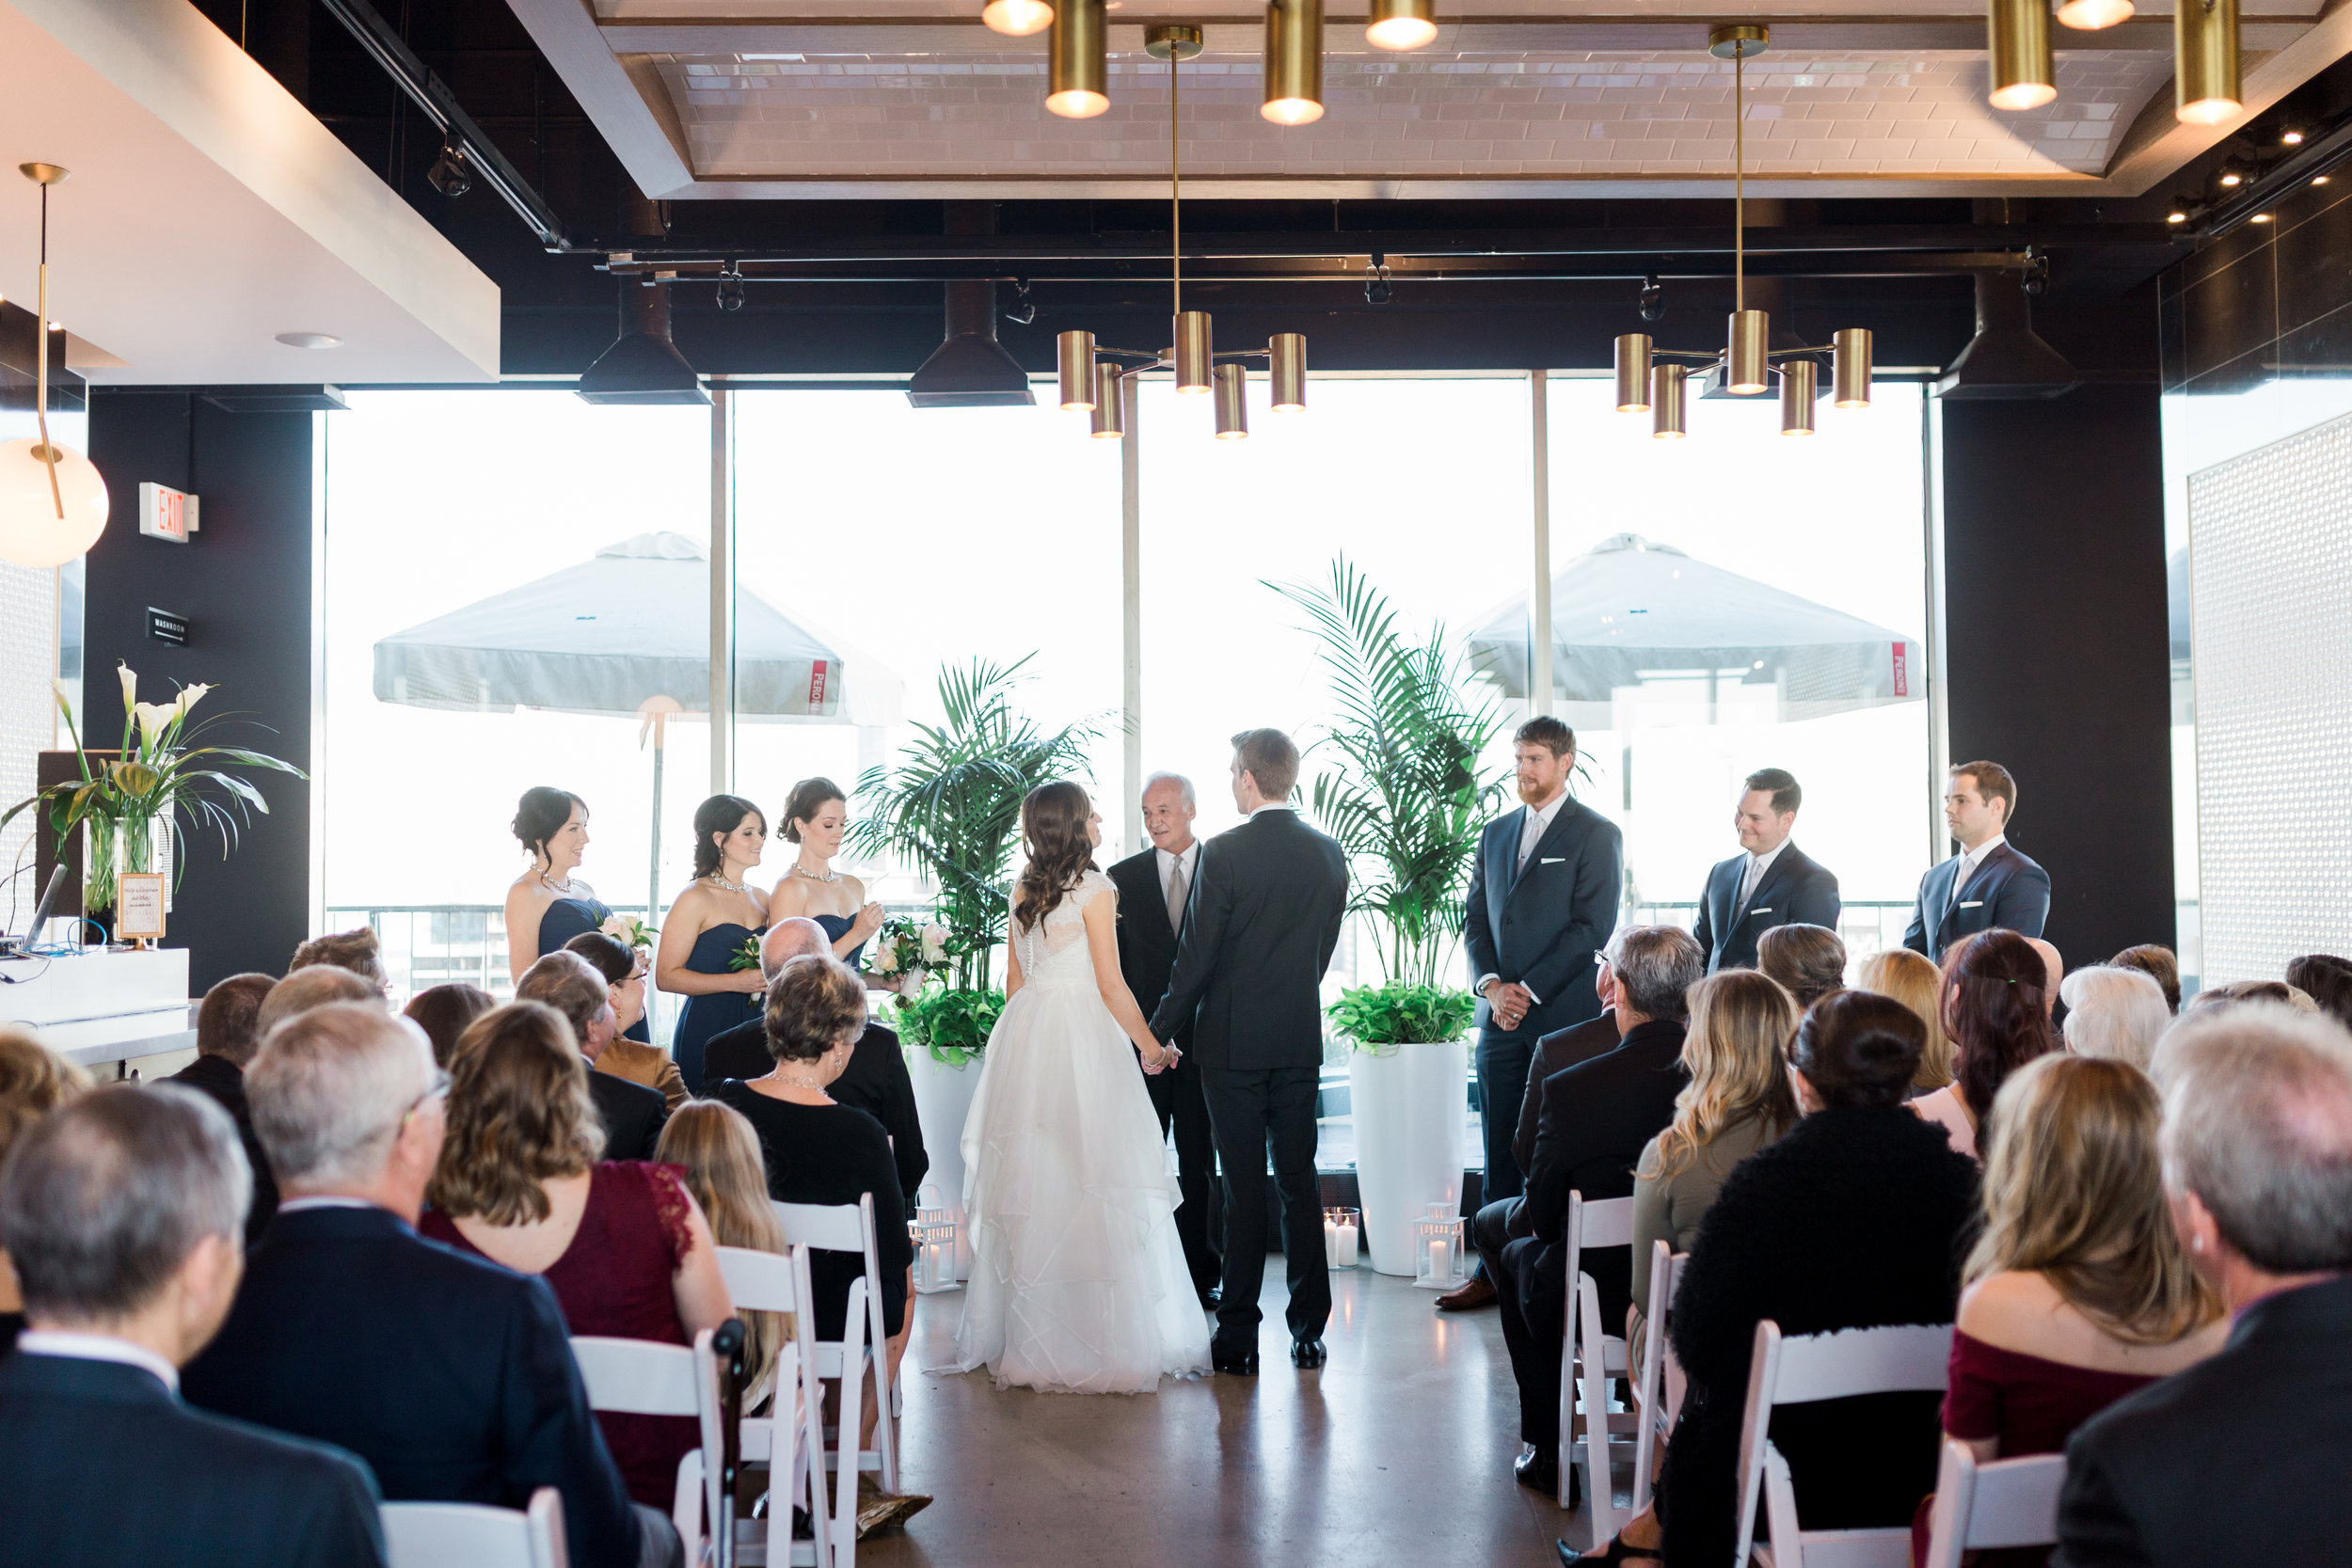 Toronto Fine Art Photographer - 180 Restaurant Wedding - Ceremony-97.jpg